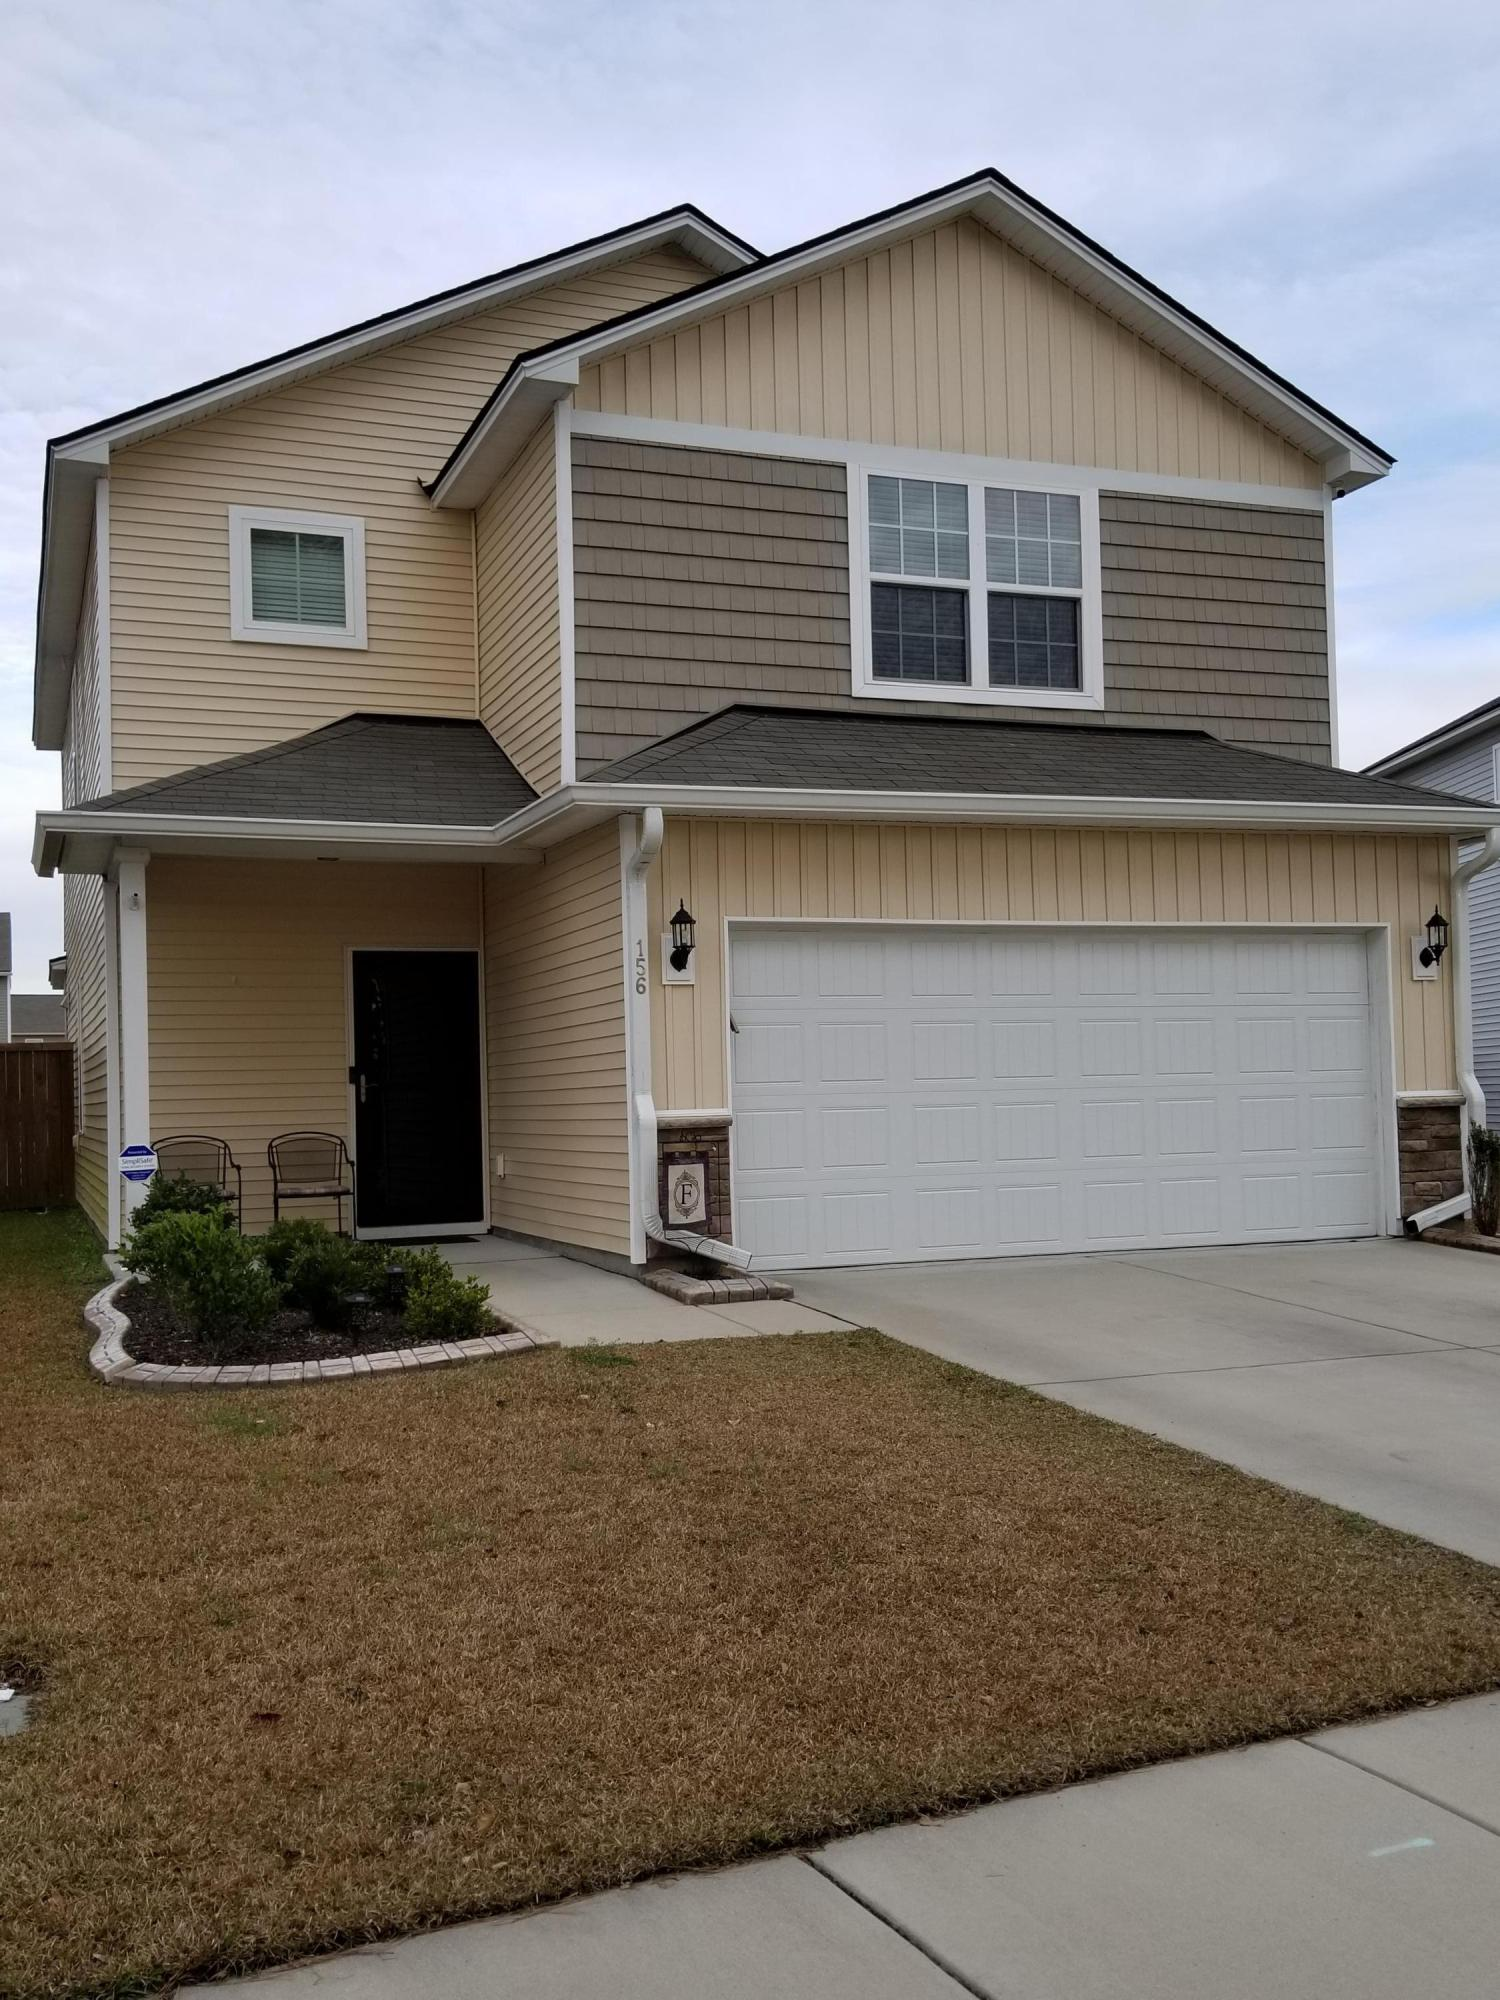 Cane Bay Plantation Homes For Sale - 156 Brookhaven, Summerville, SC - 41